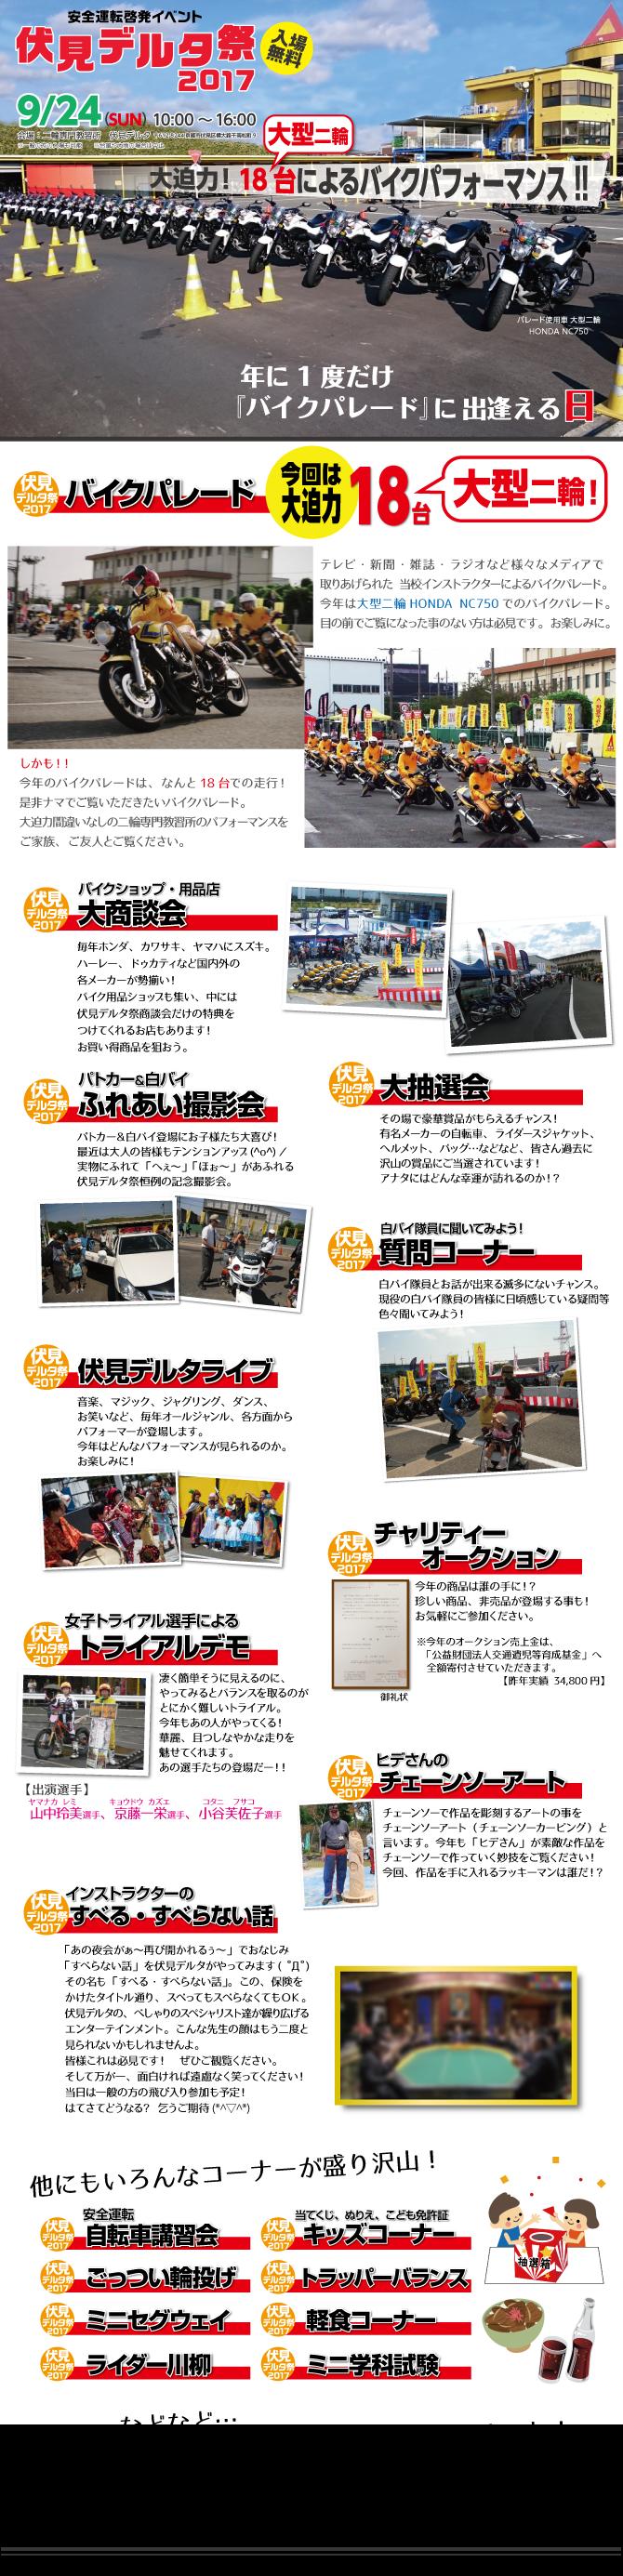 fdf2017-page